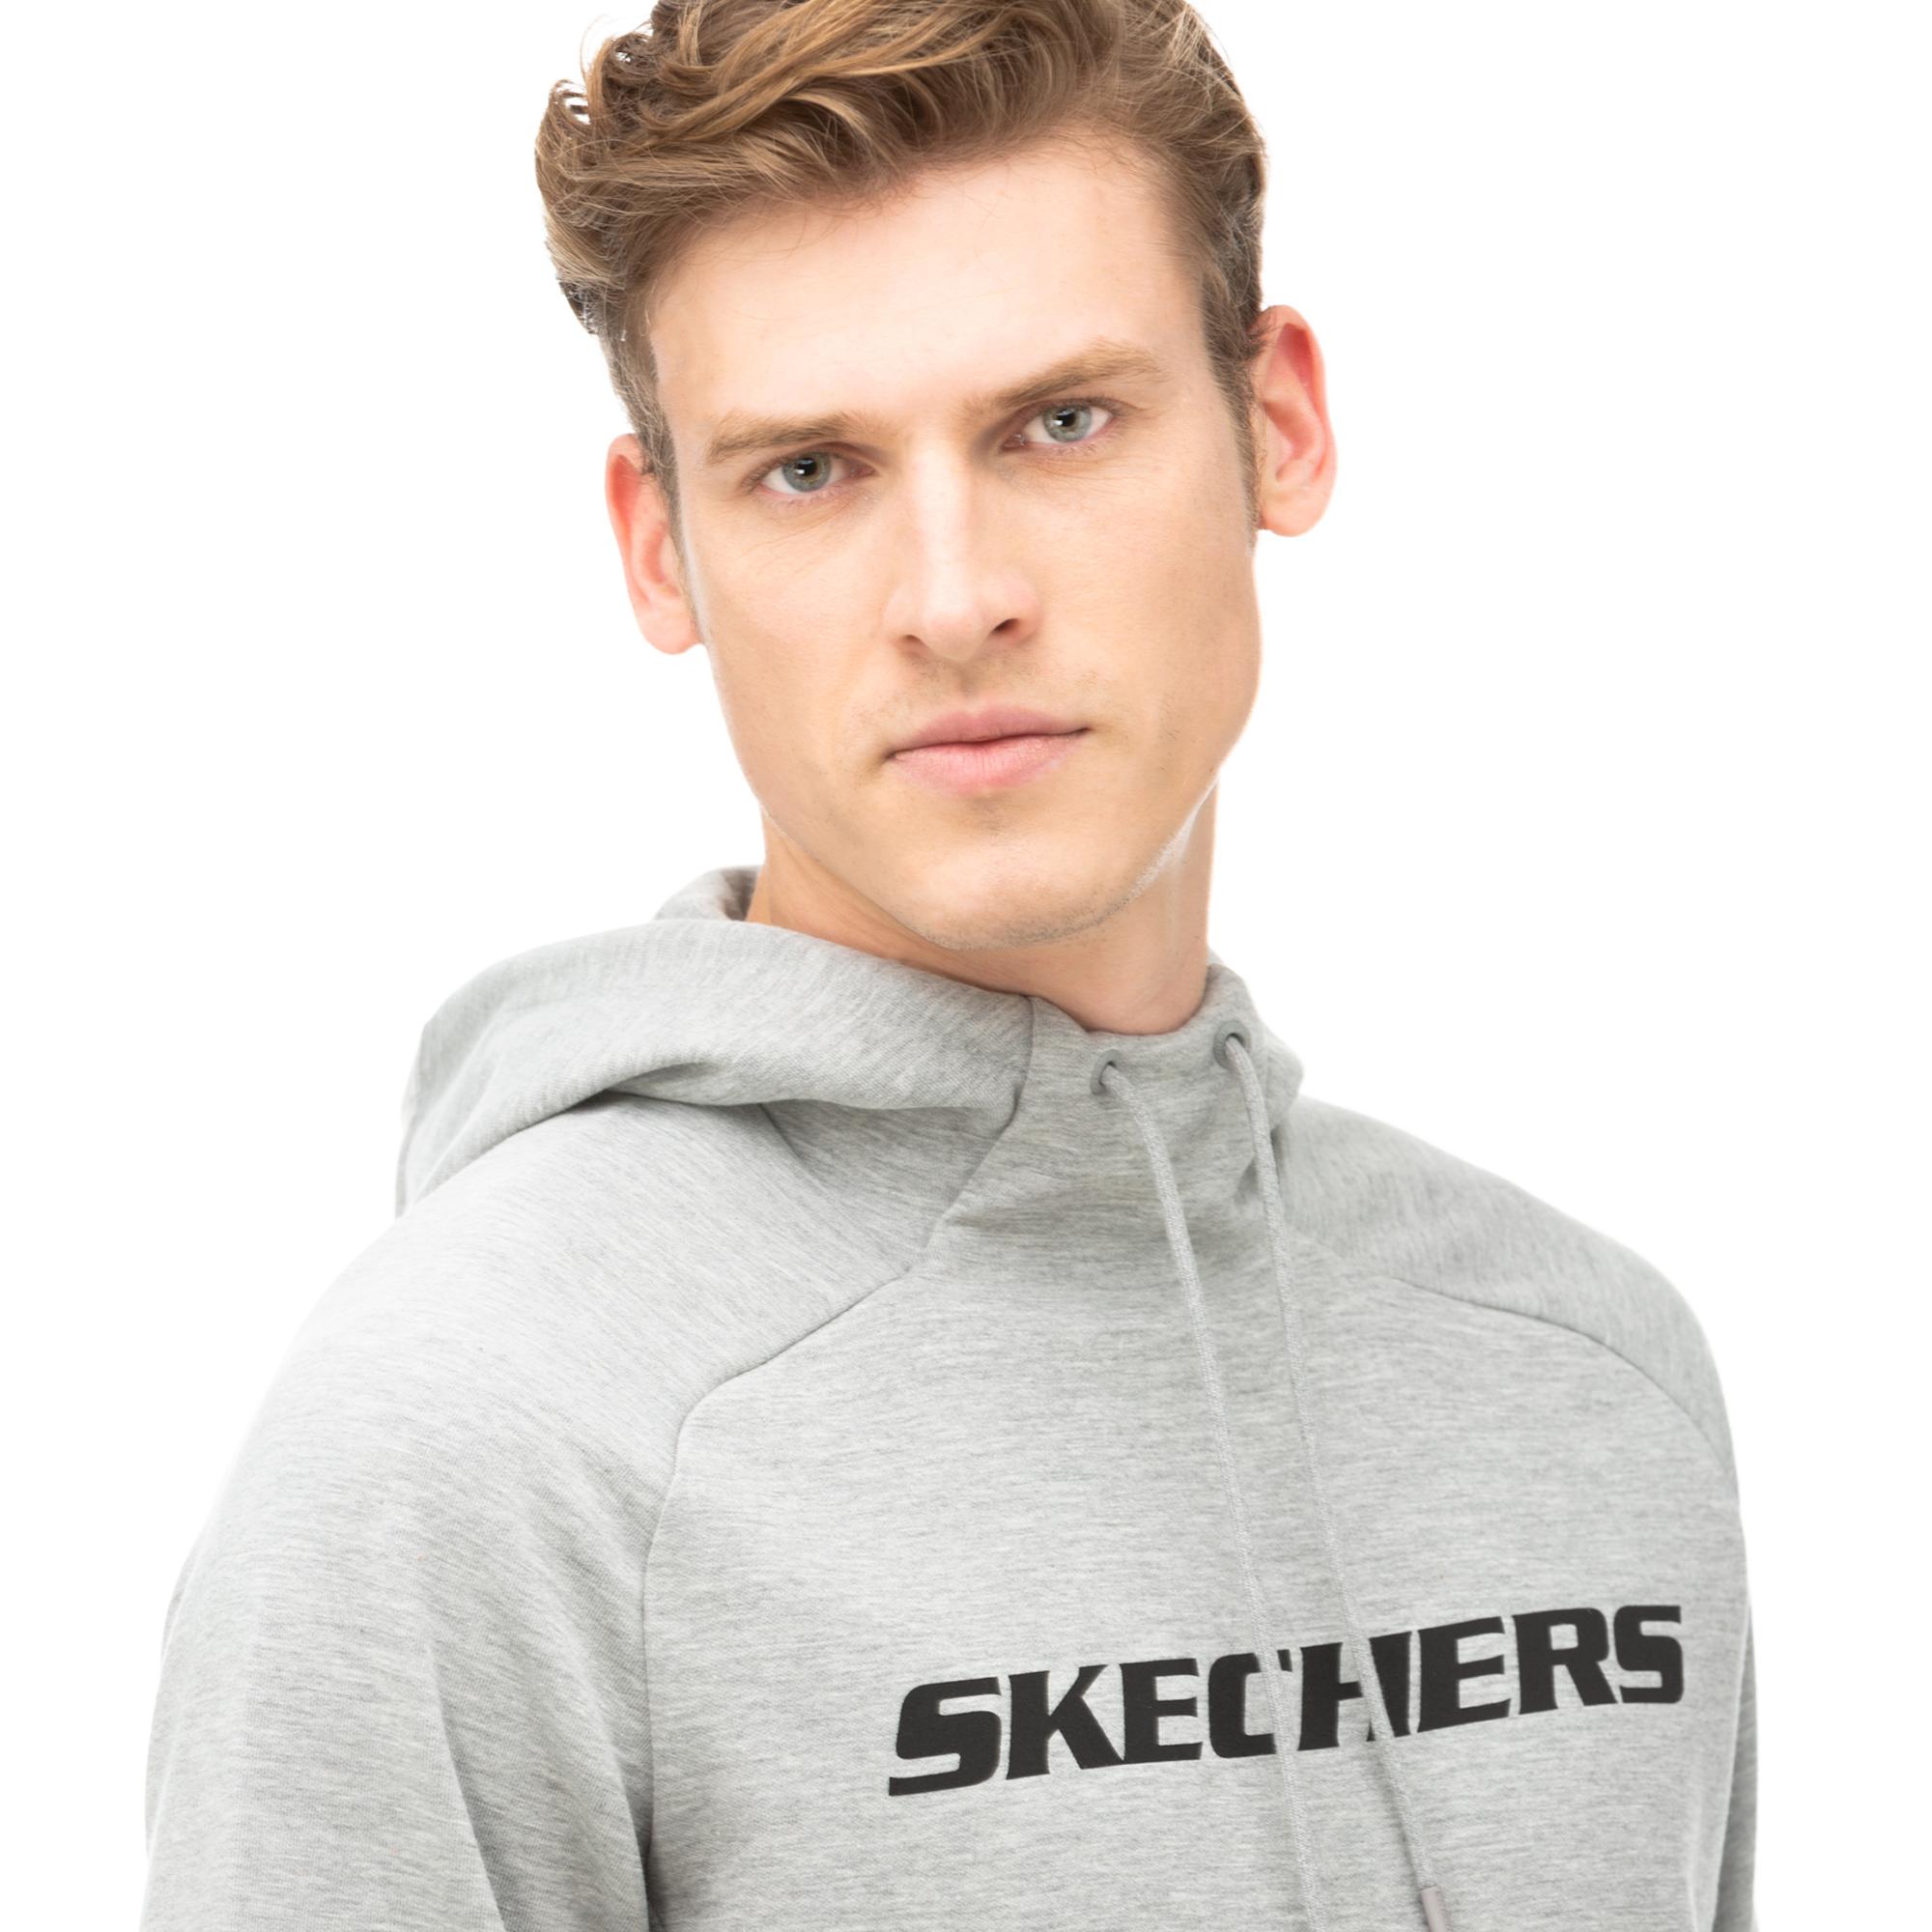 Skechers 2X I-Lock FLX Gri Erkek Sweatshirt